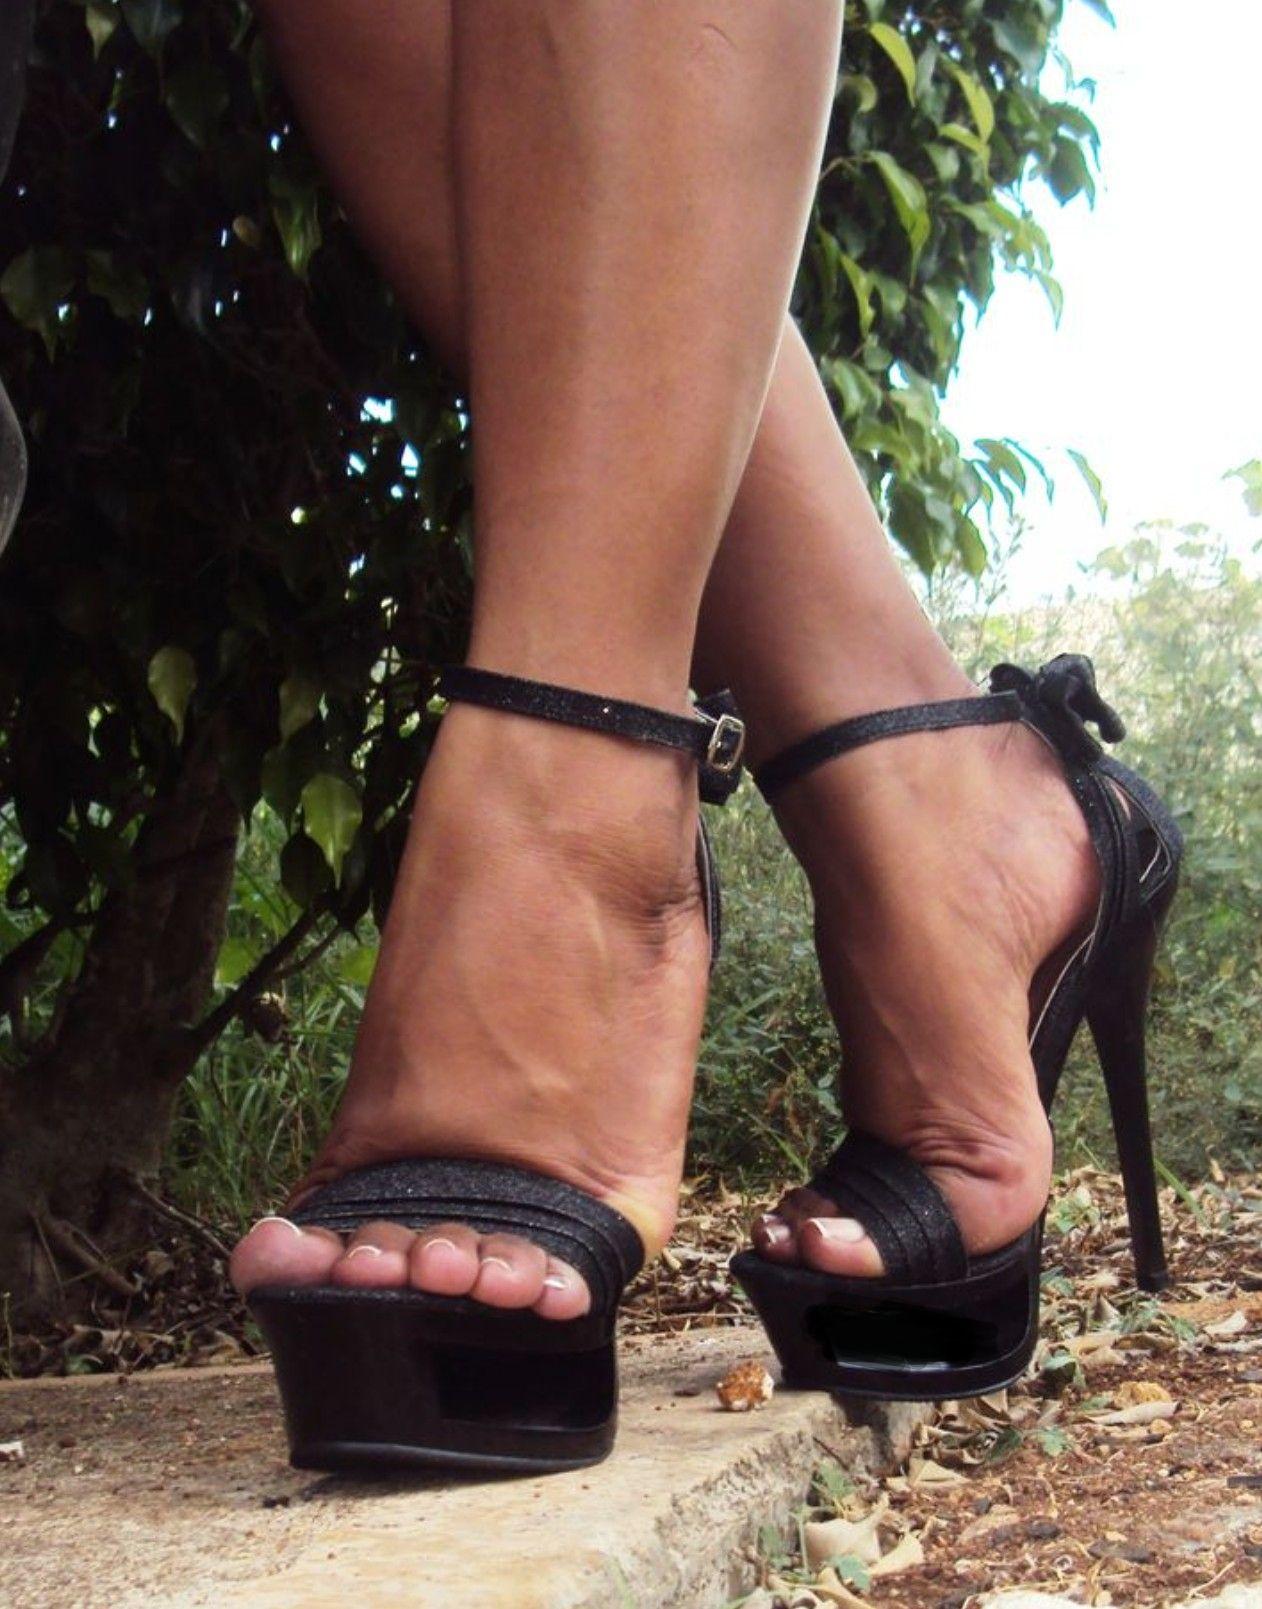 Femdom Foot Heels